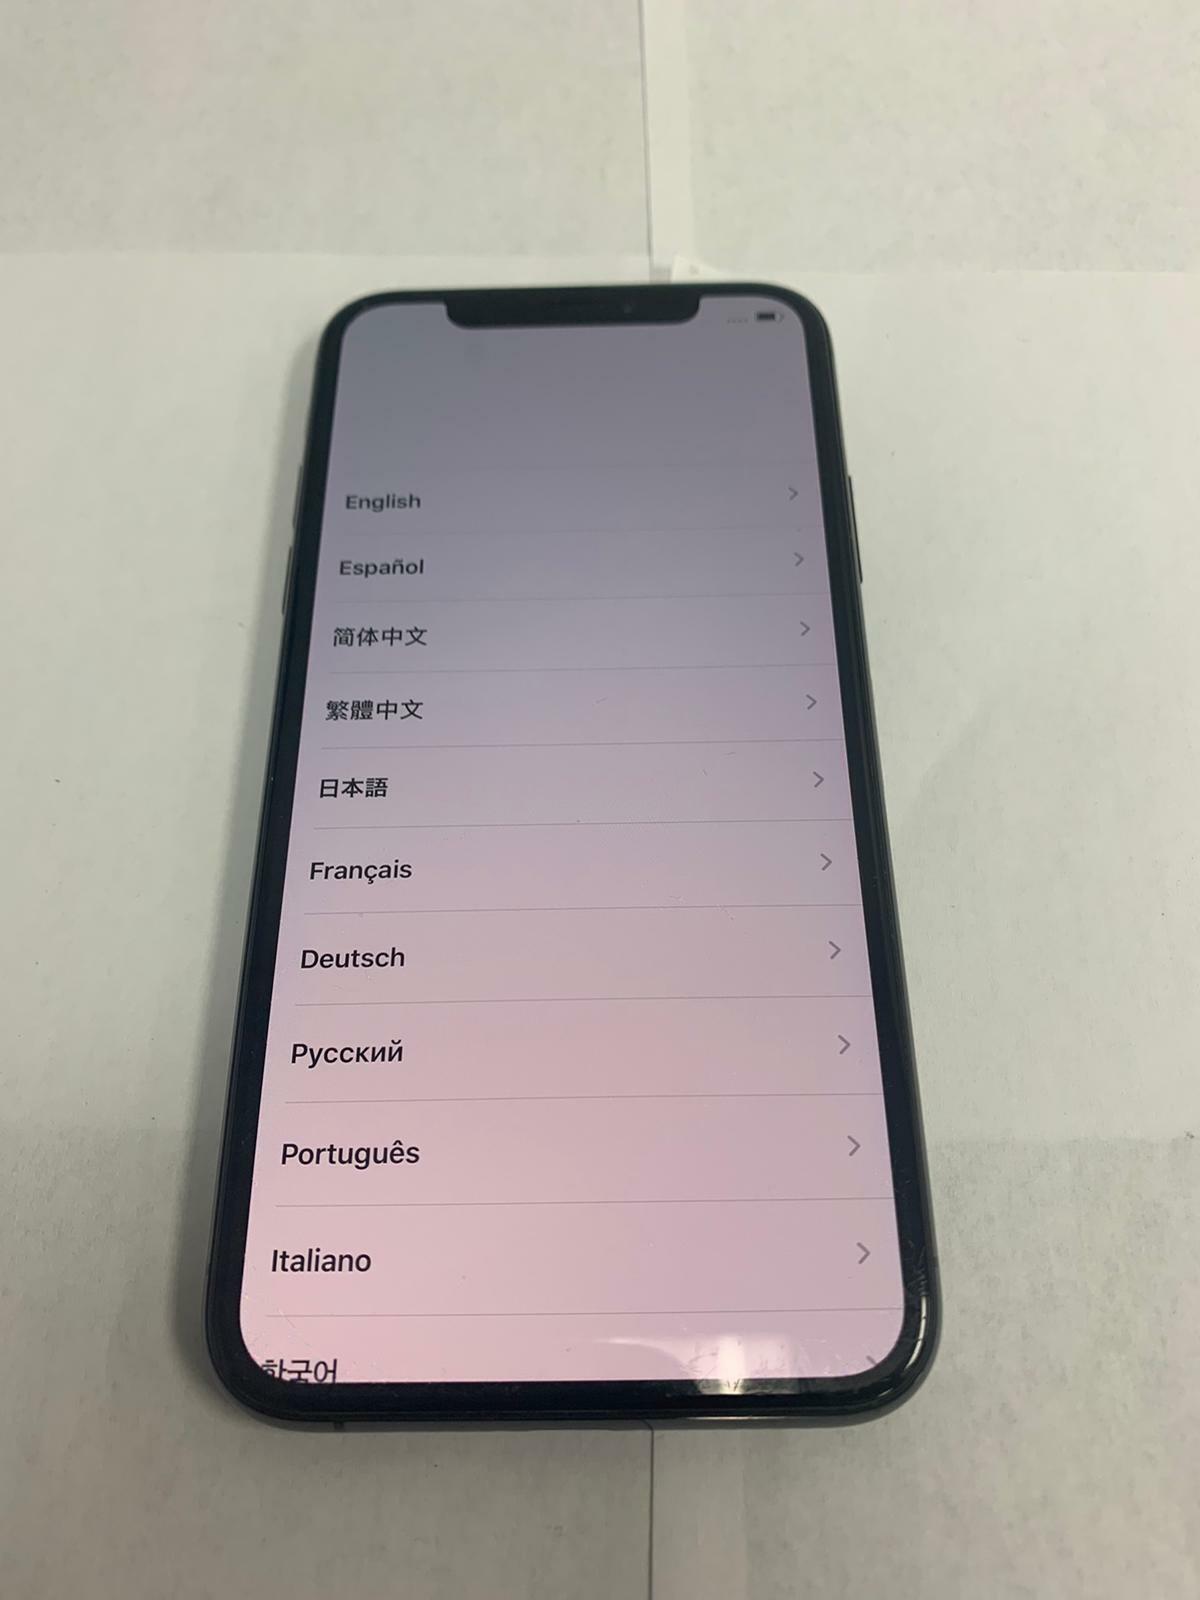 Apple IPhone XS - 64GB - Space Gray Unlocked A1920 CDMA GSM C221 - $315.00